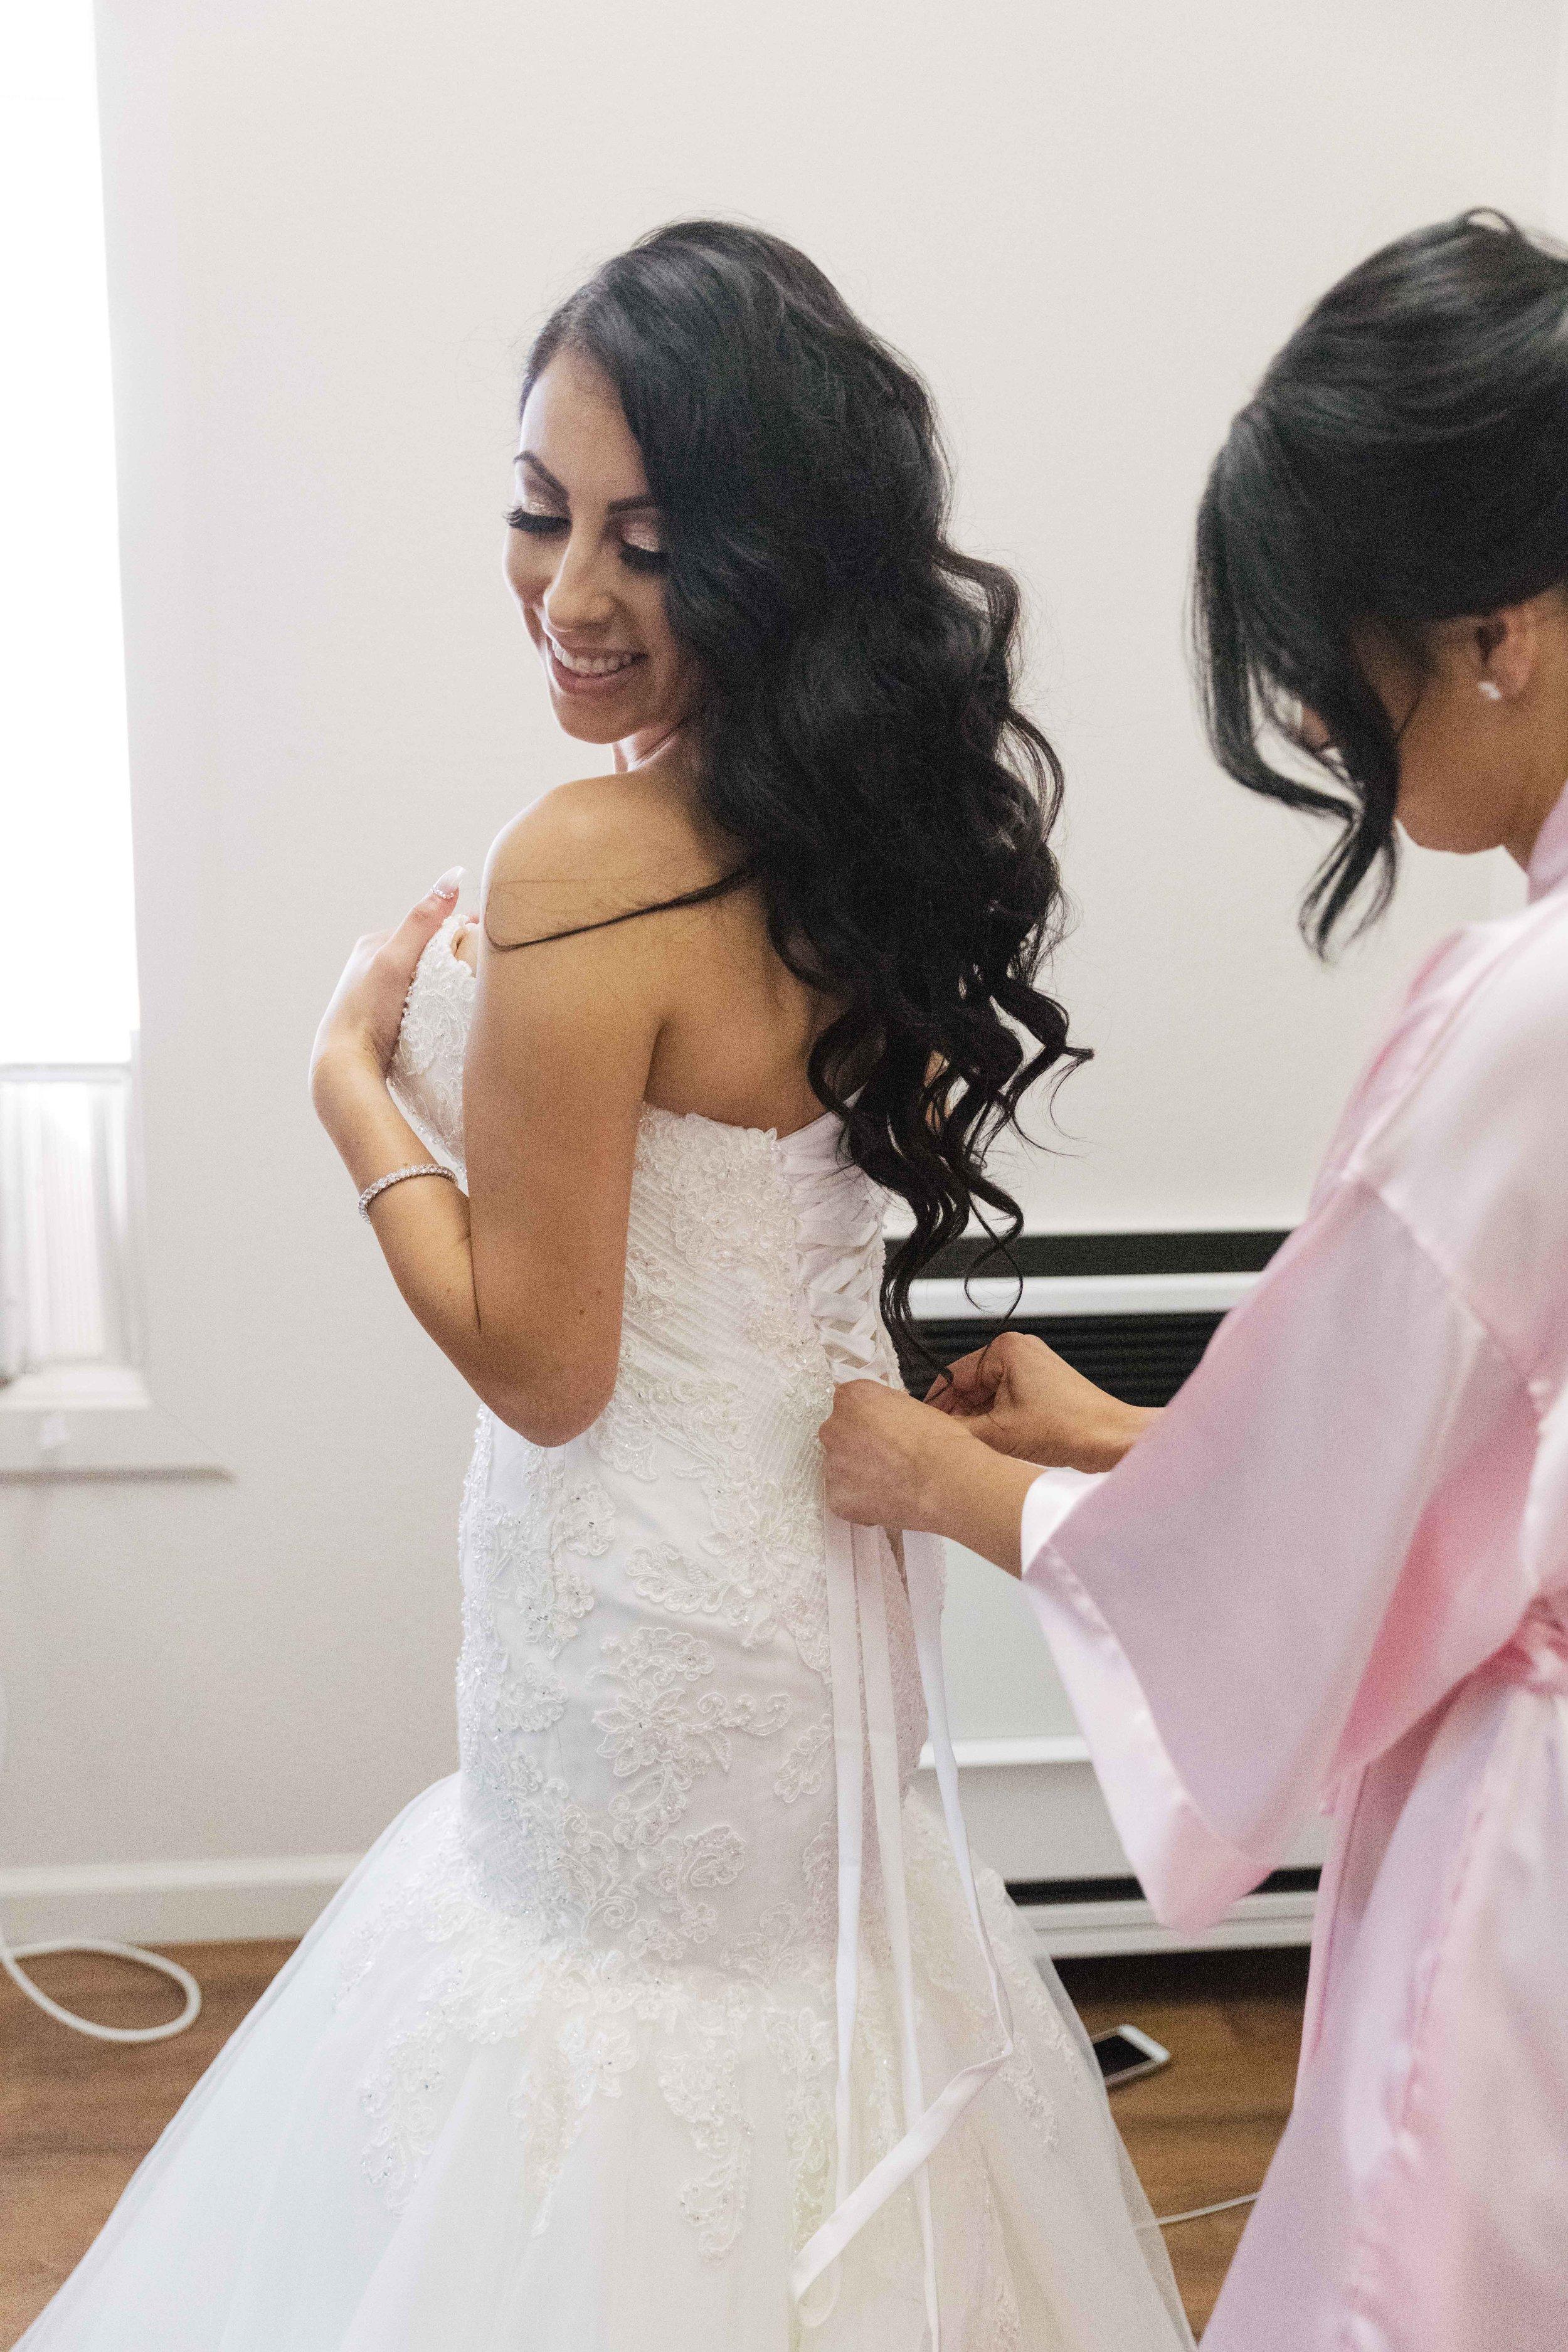 san-juan-bautista-photographer-tony-monse-wedding-74.JPG